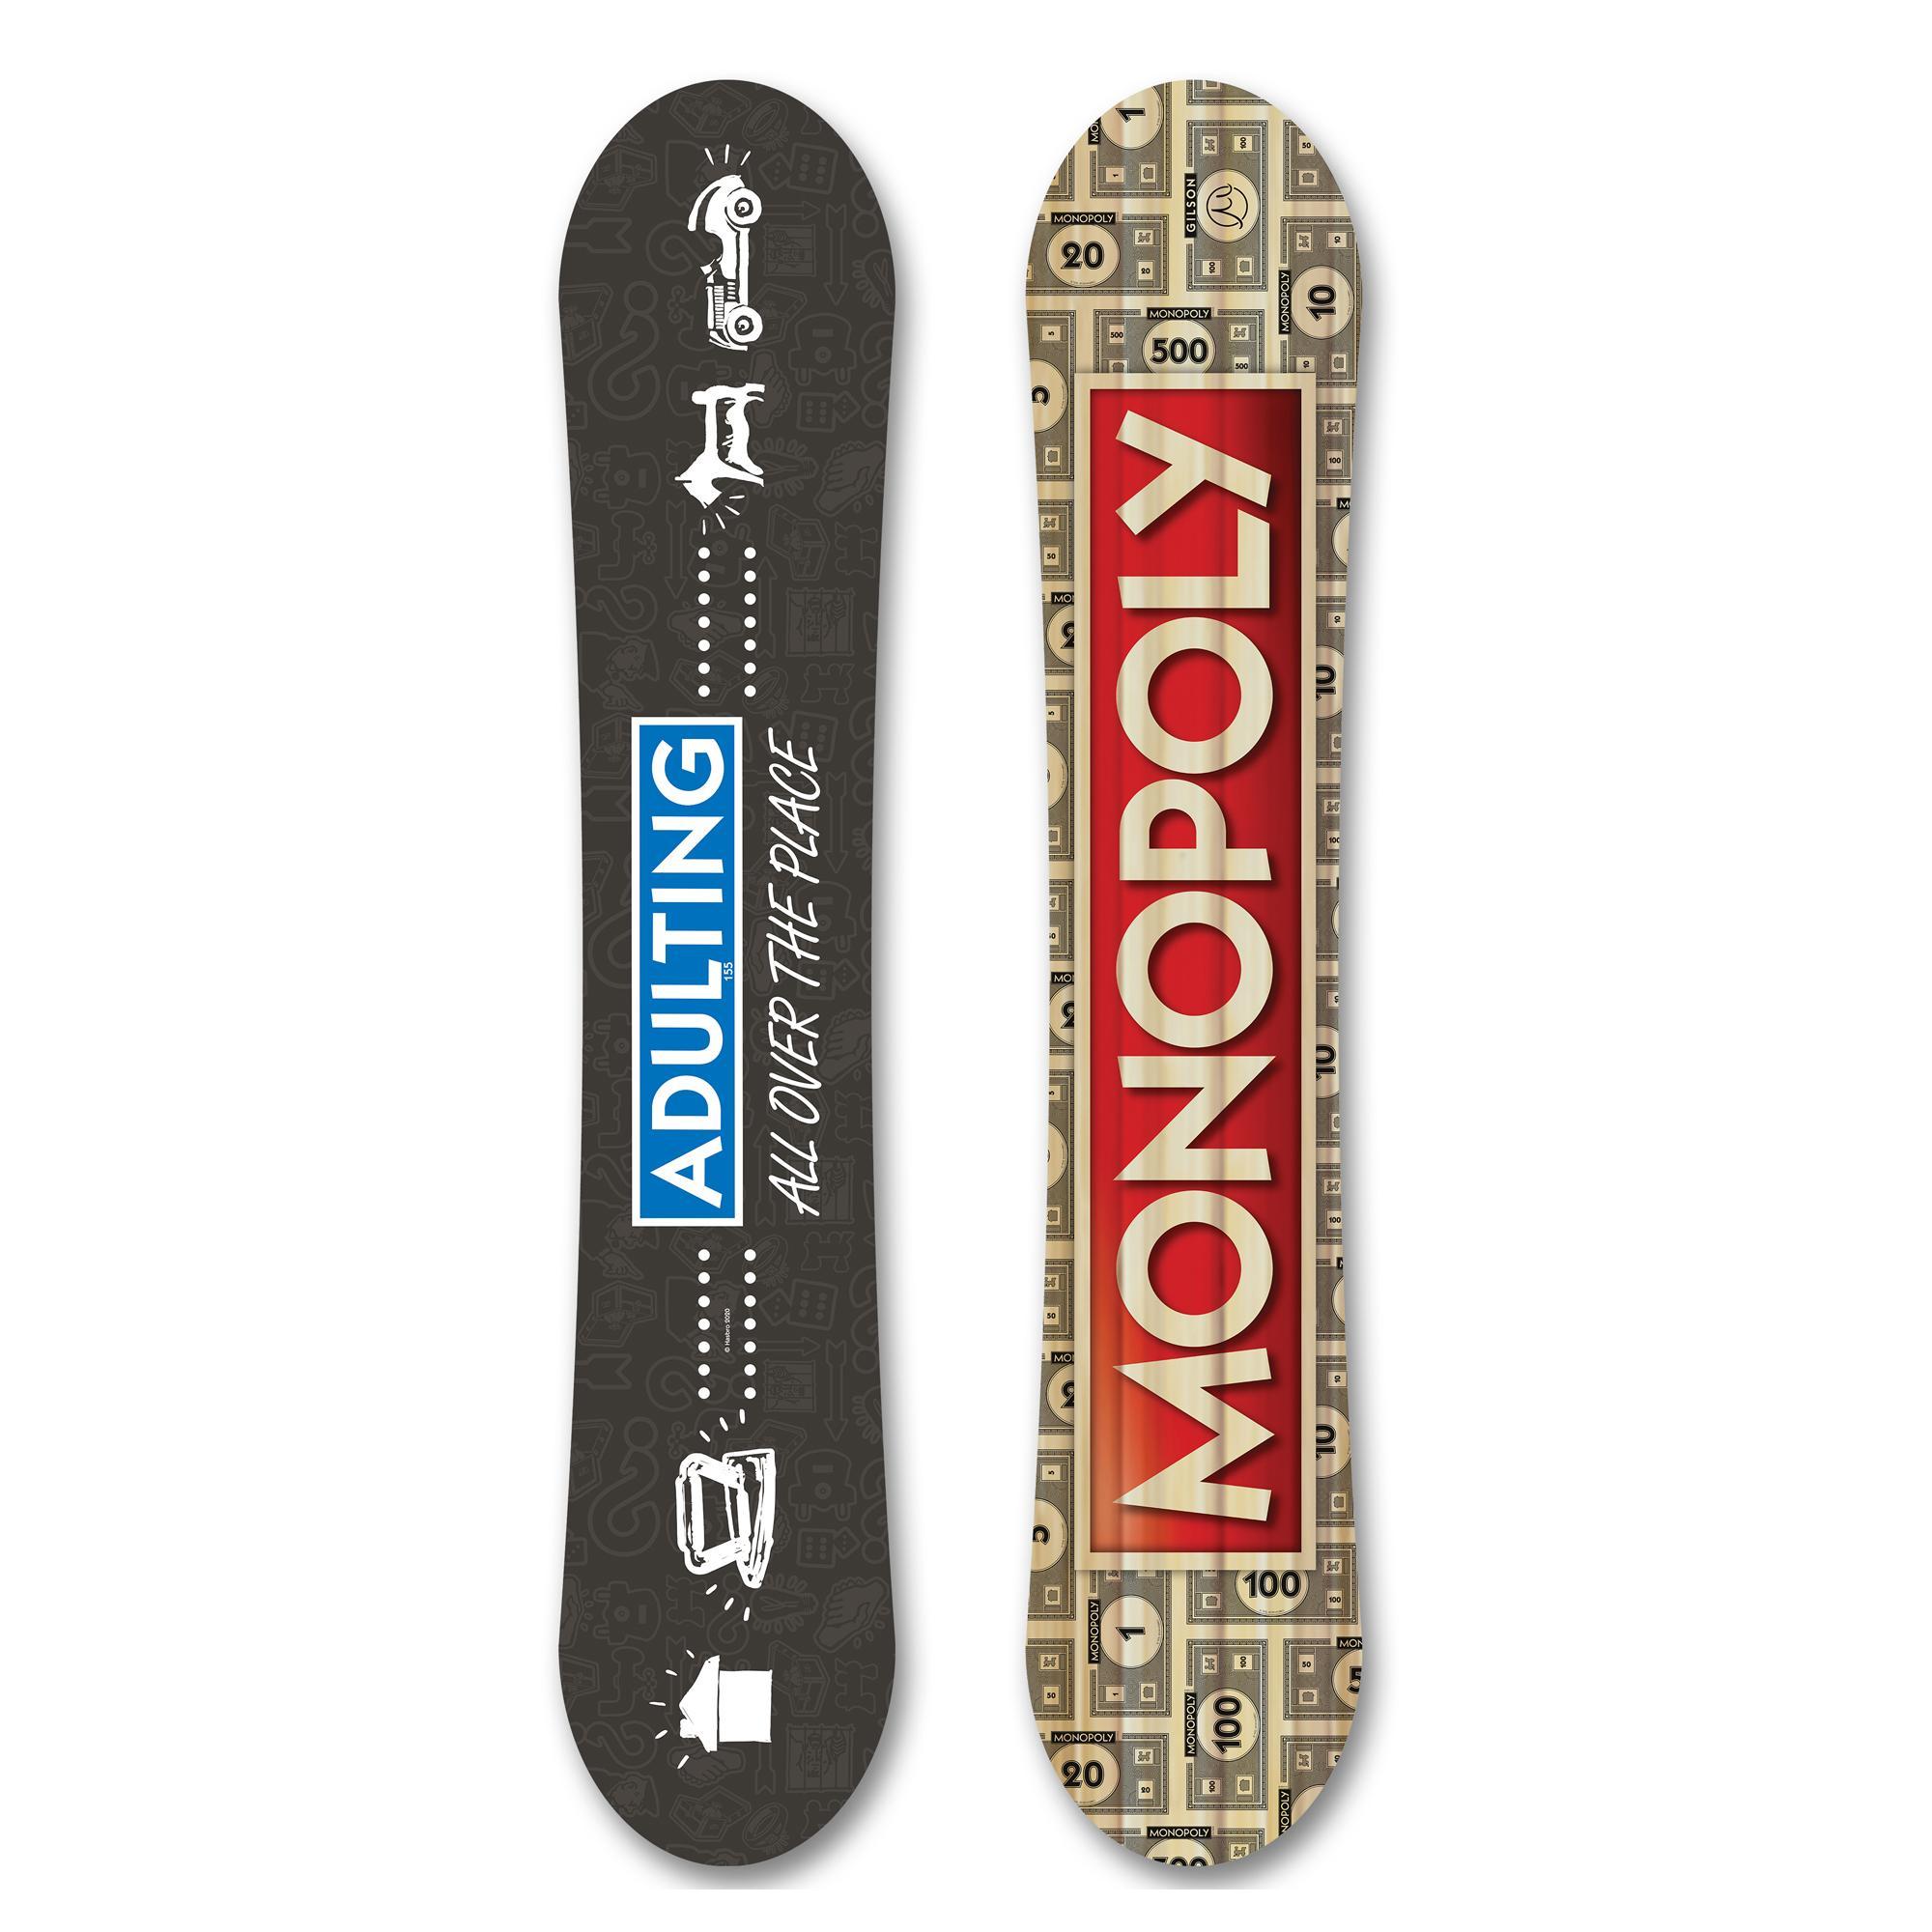 Gilson Snow Monopoly Snowboard - Adulting (theme)